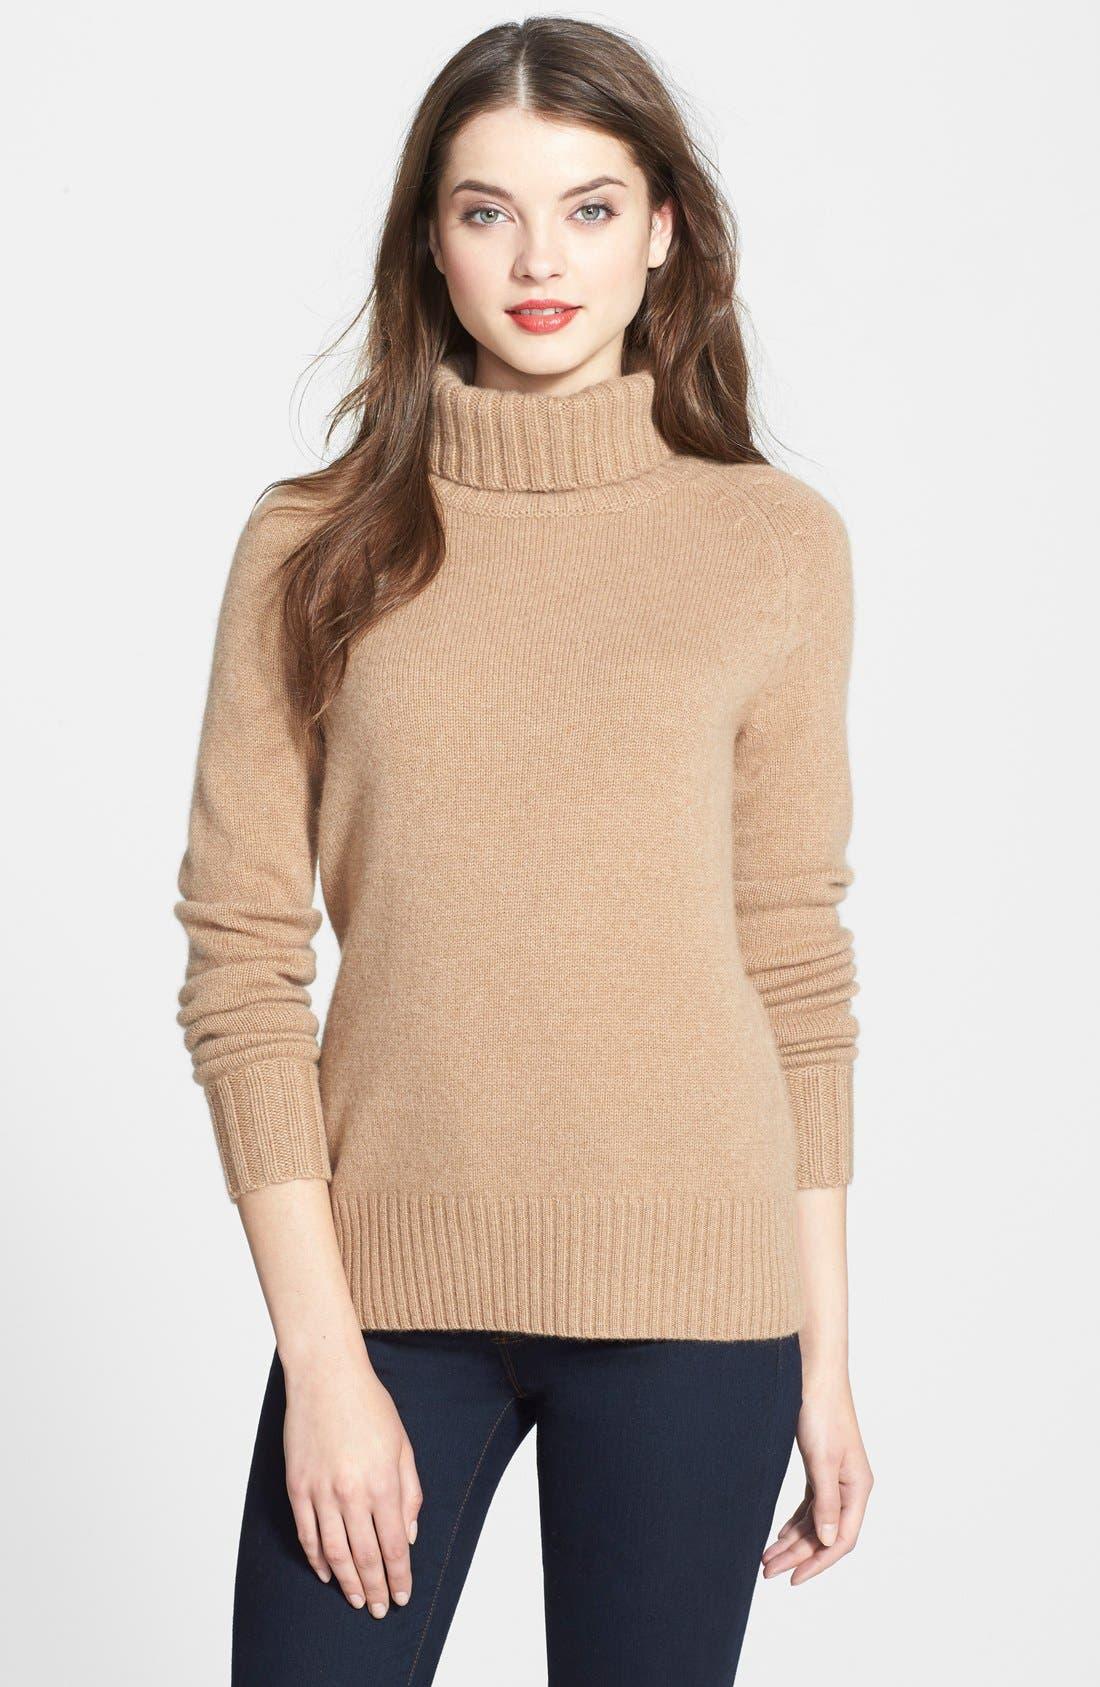 Alternate Image 1 Selected - Halogen® Turtleneck Cashmere Sweater (Regular & Petite)